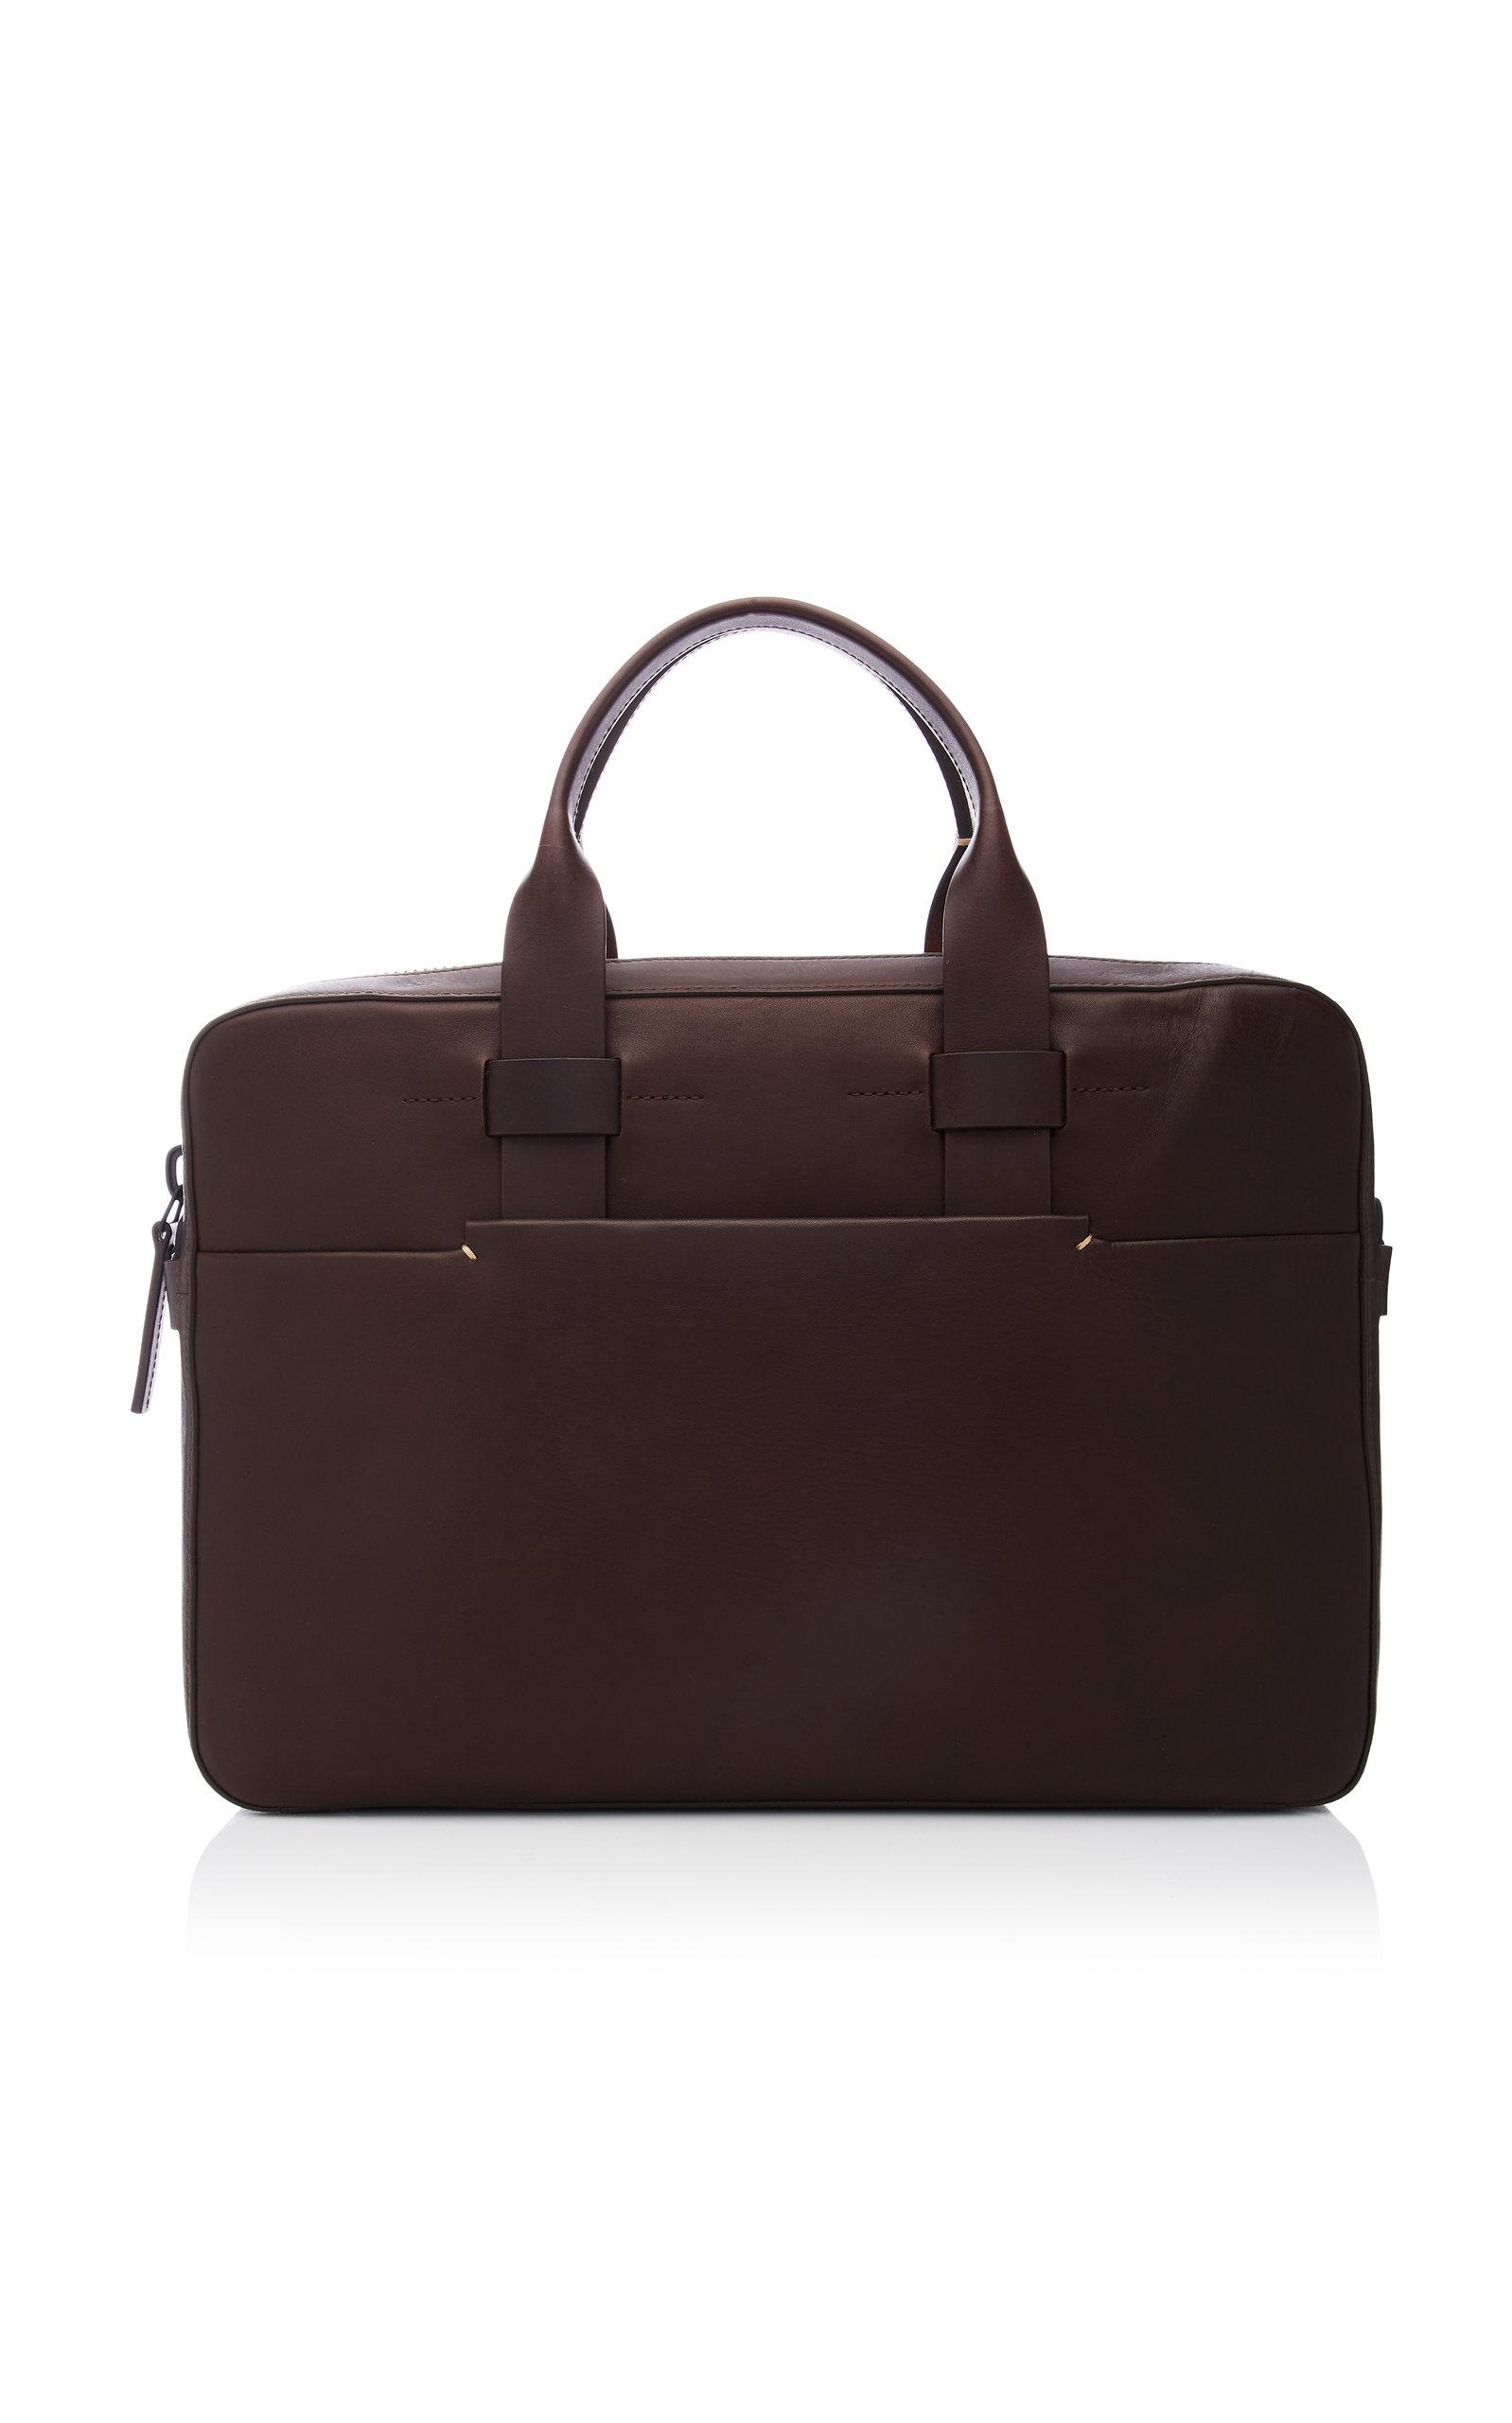 Troubadour Trailblazer Leather Briefcase In Brown